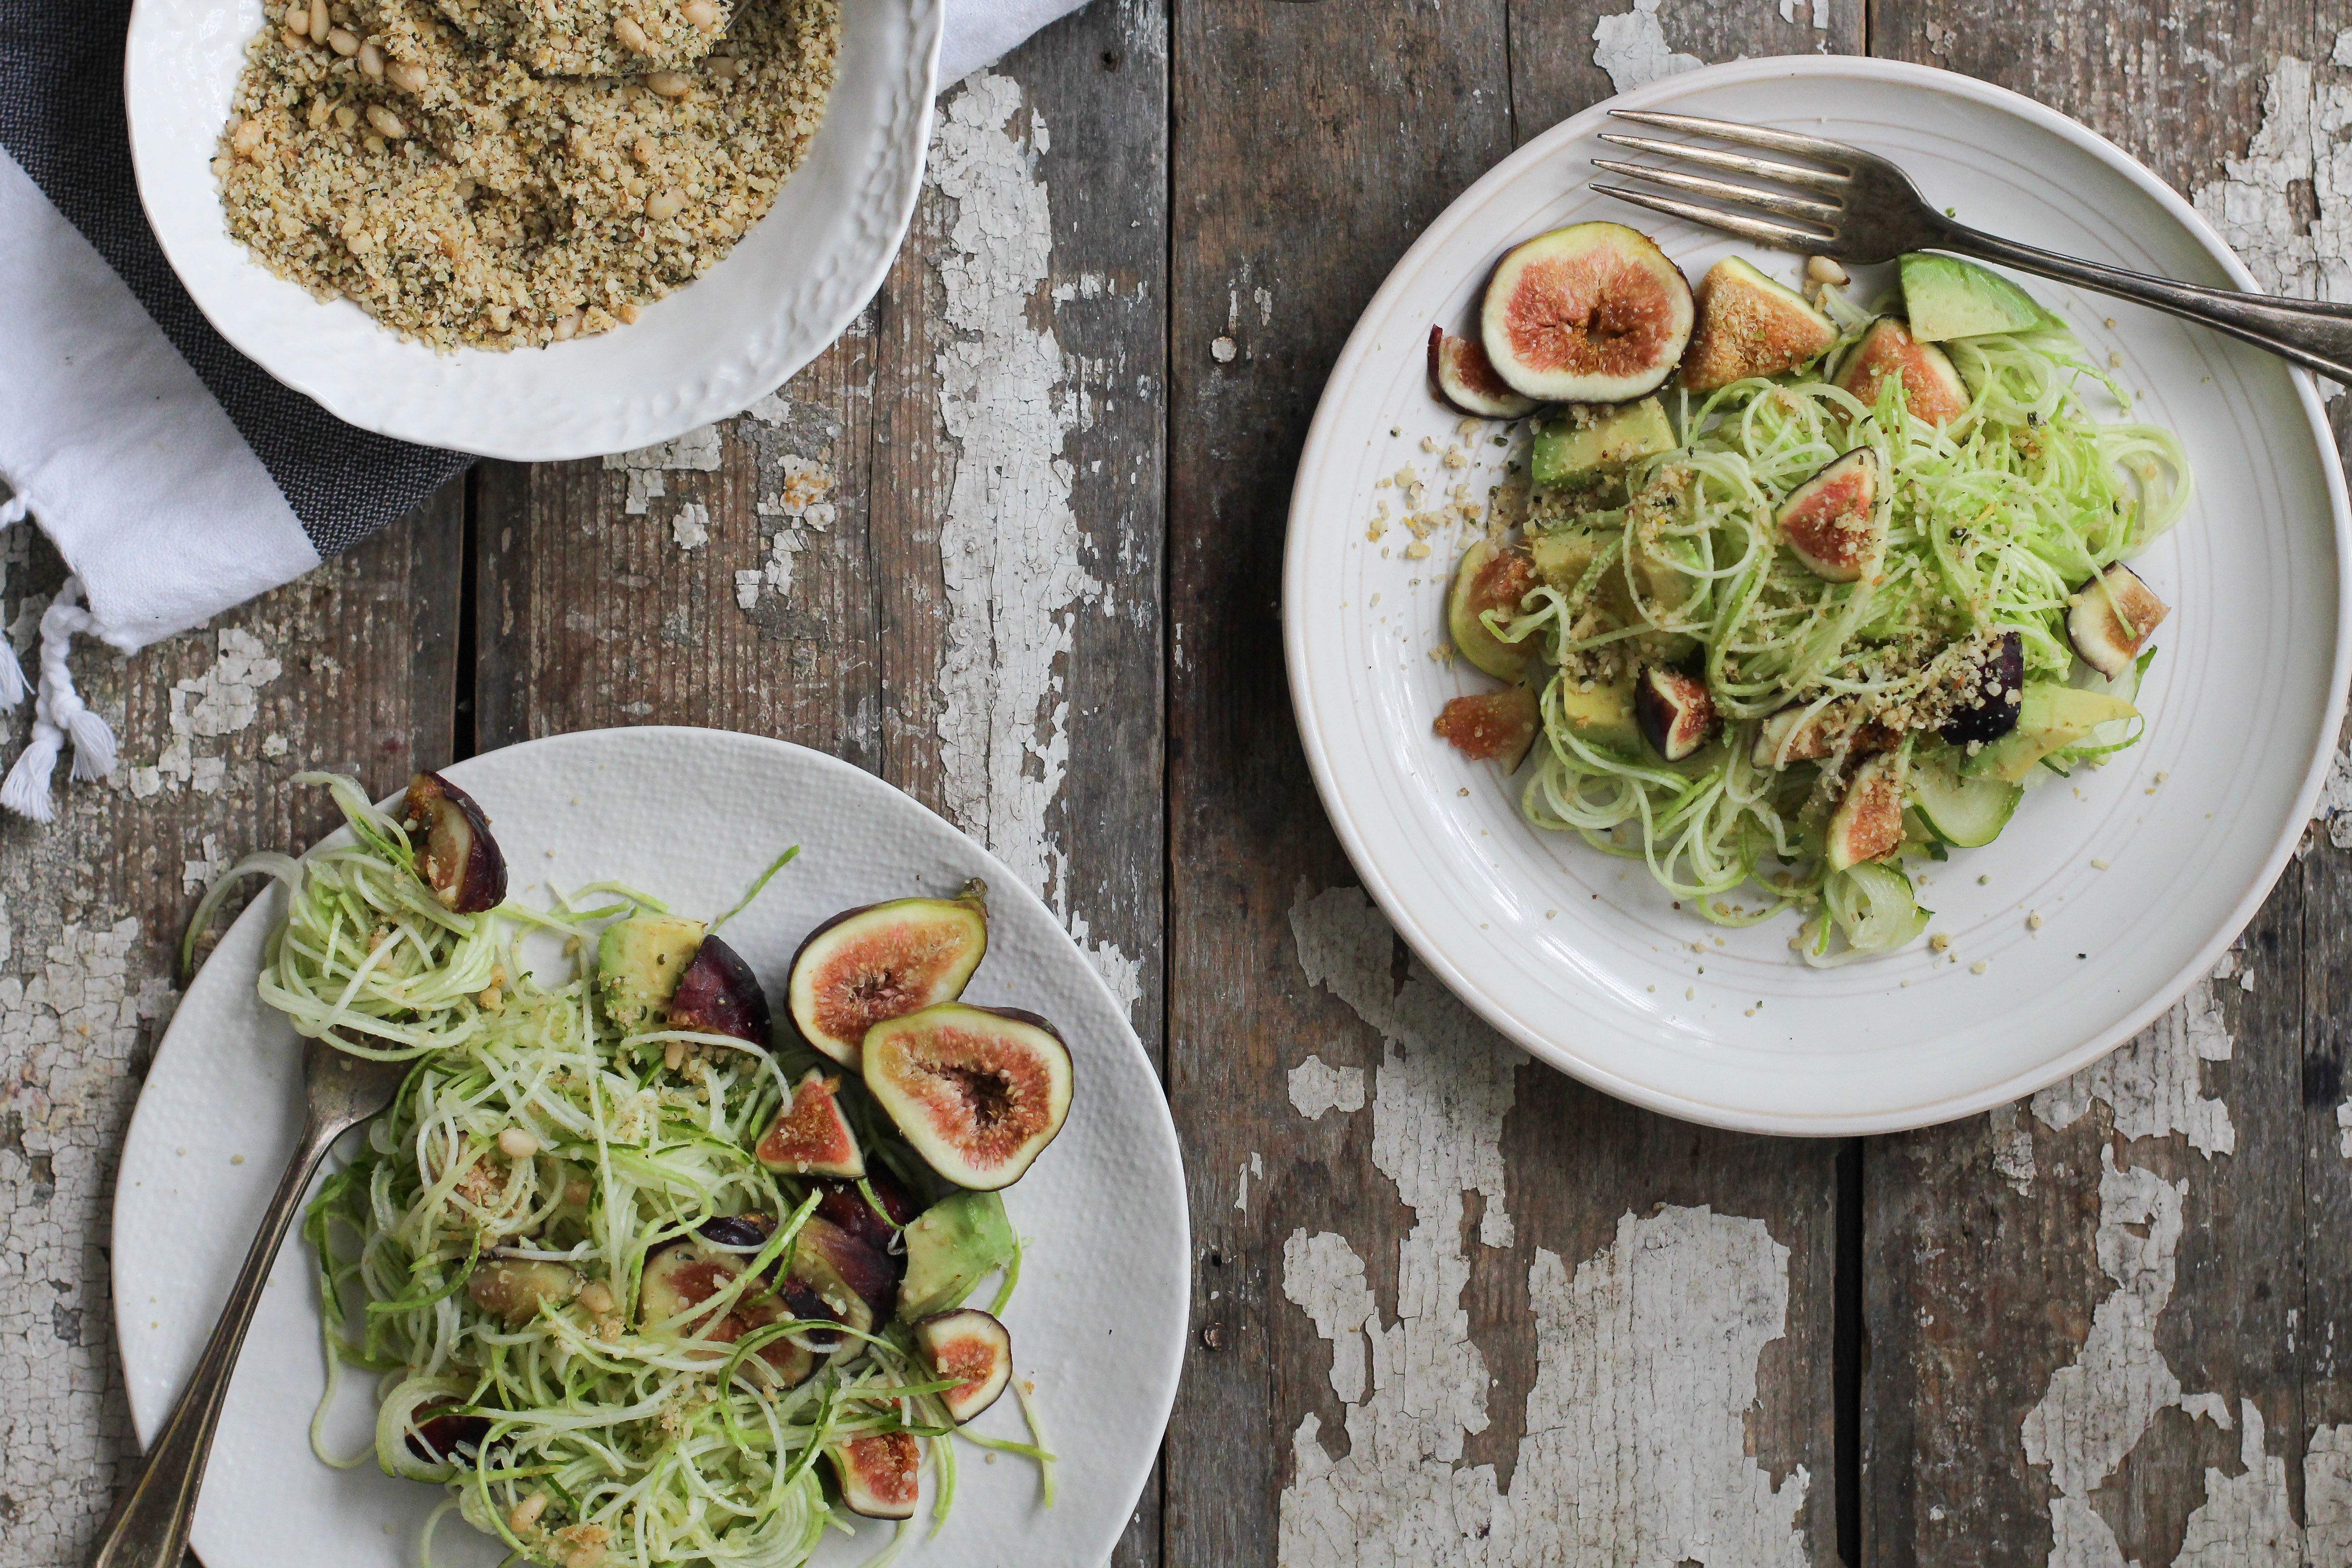 Fig Zucchini Pasta with Hemp Seed Crumble